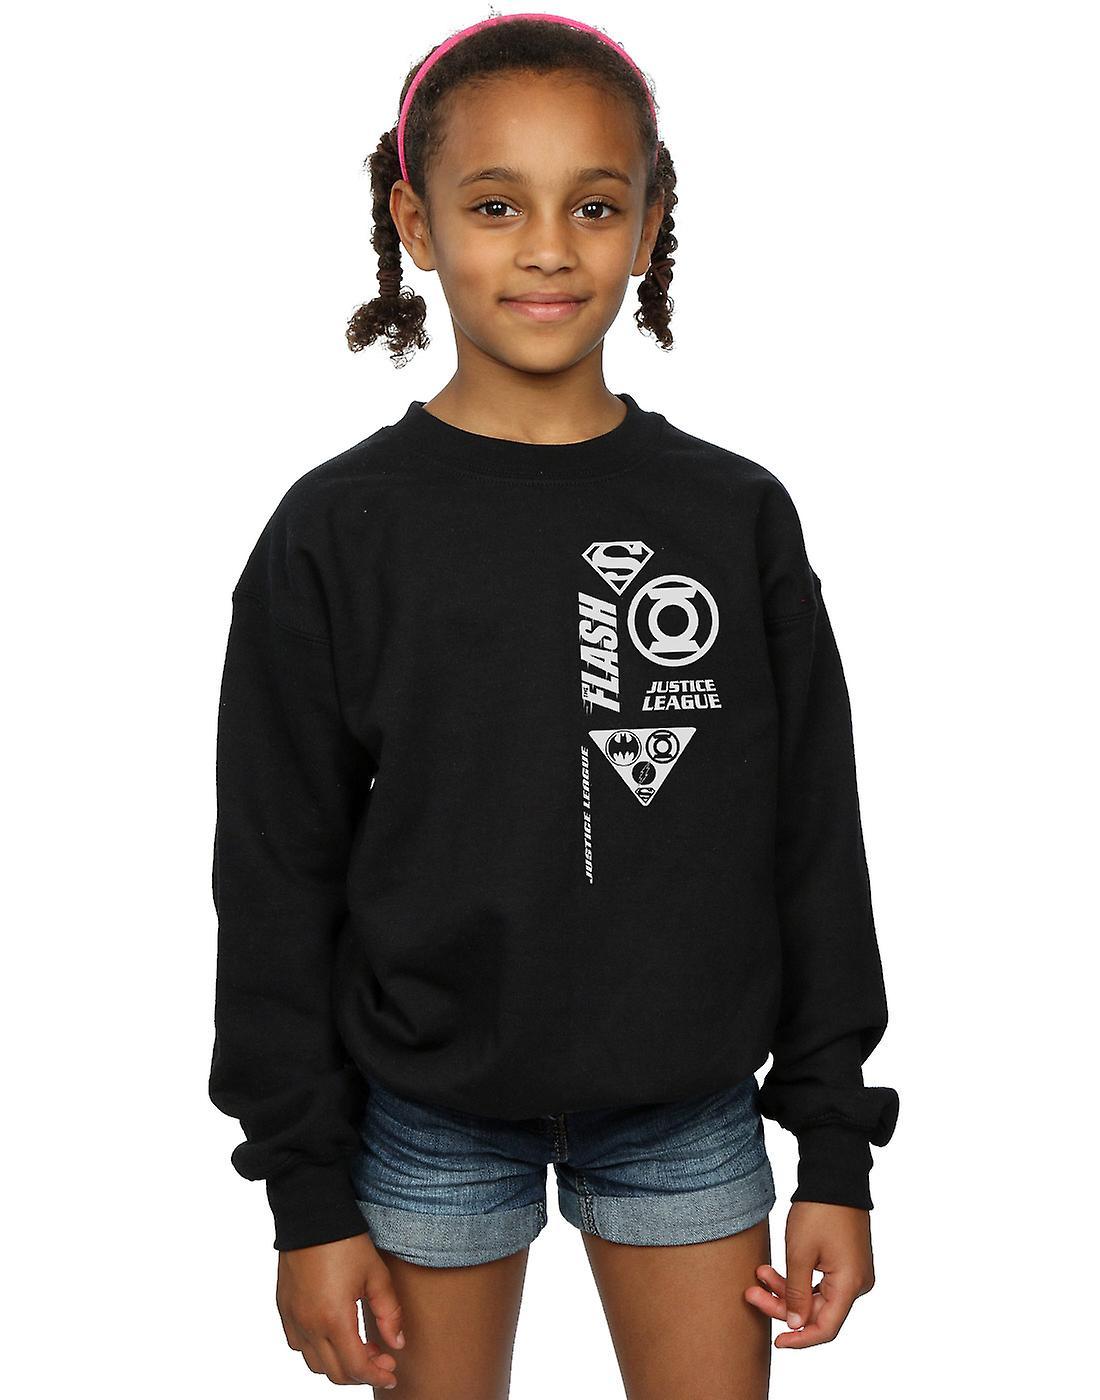 DC Comics Girls Justice League Chest Icons Sweatshirt